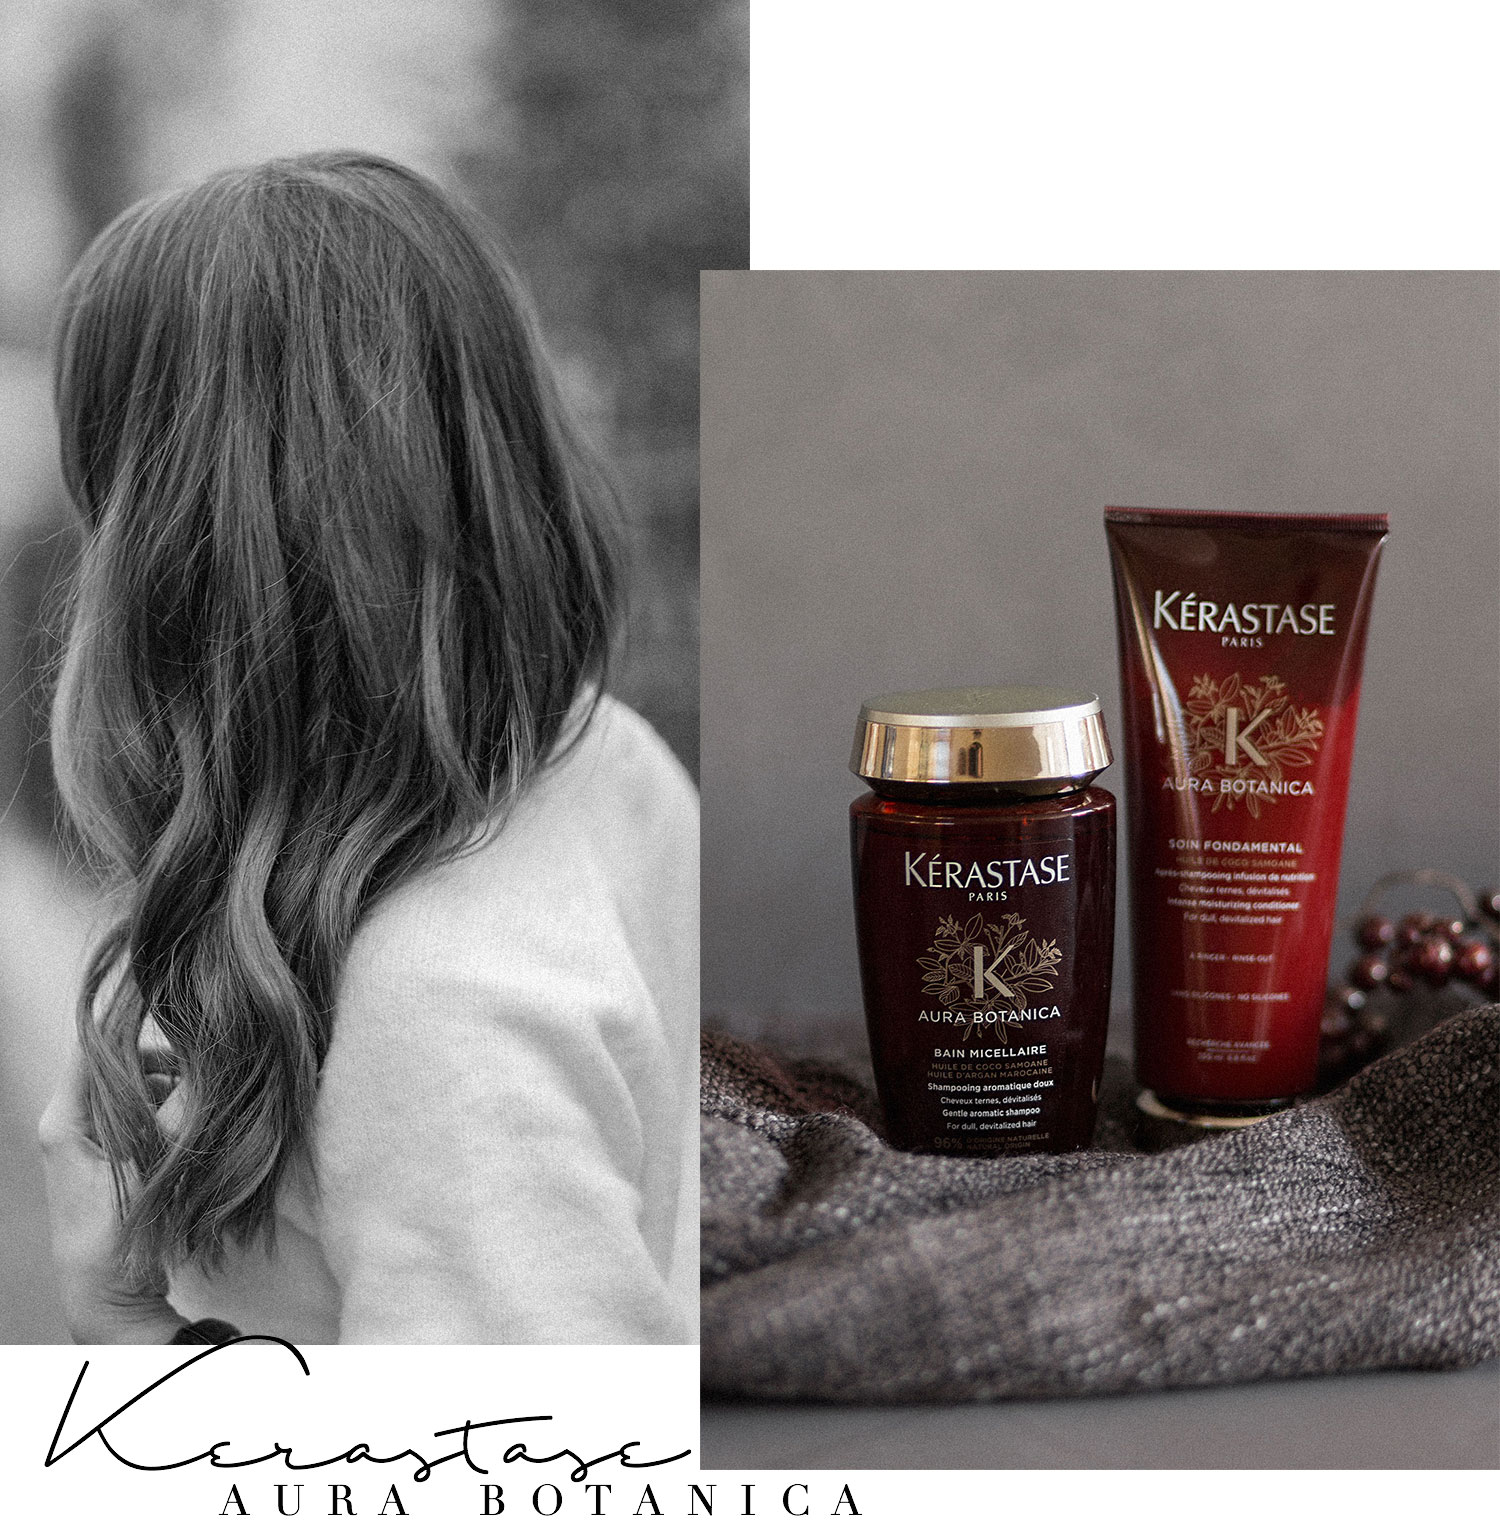 Kerastase Aura Botanica Erfahrungen, natürliche Haarpflege Test, Naturkosmetik, bezauberndenana.de